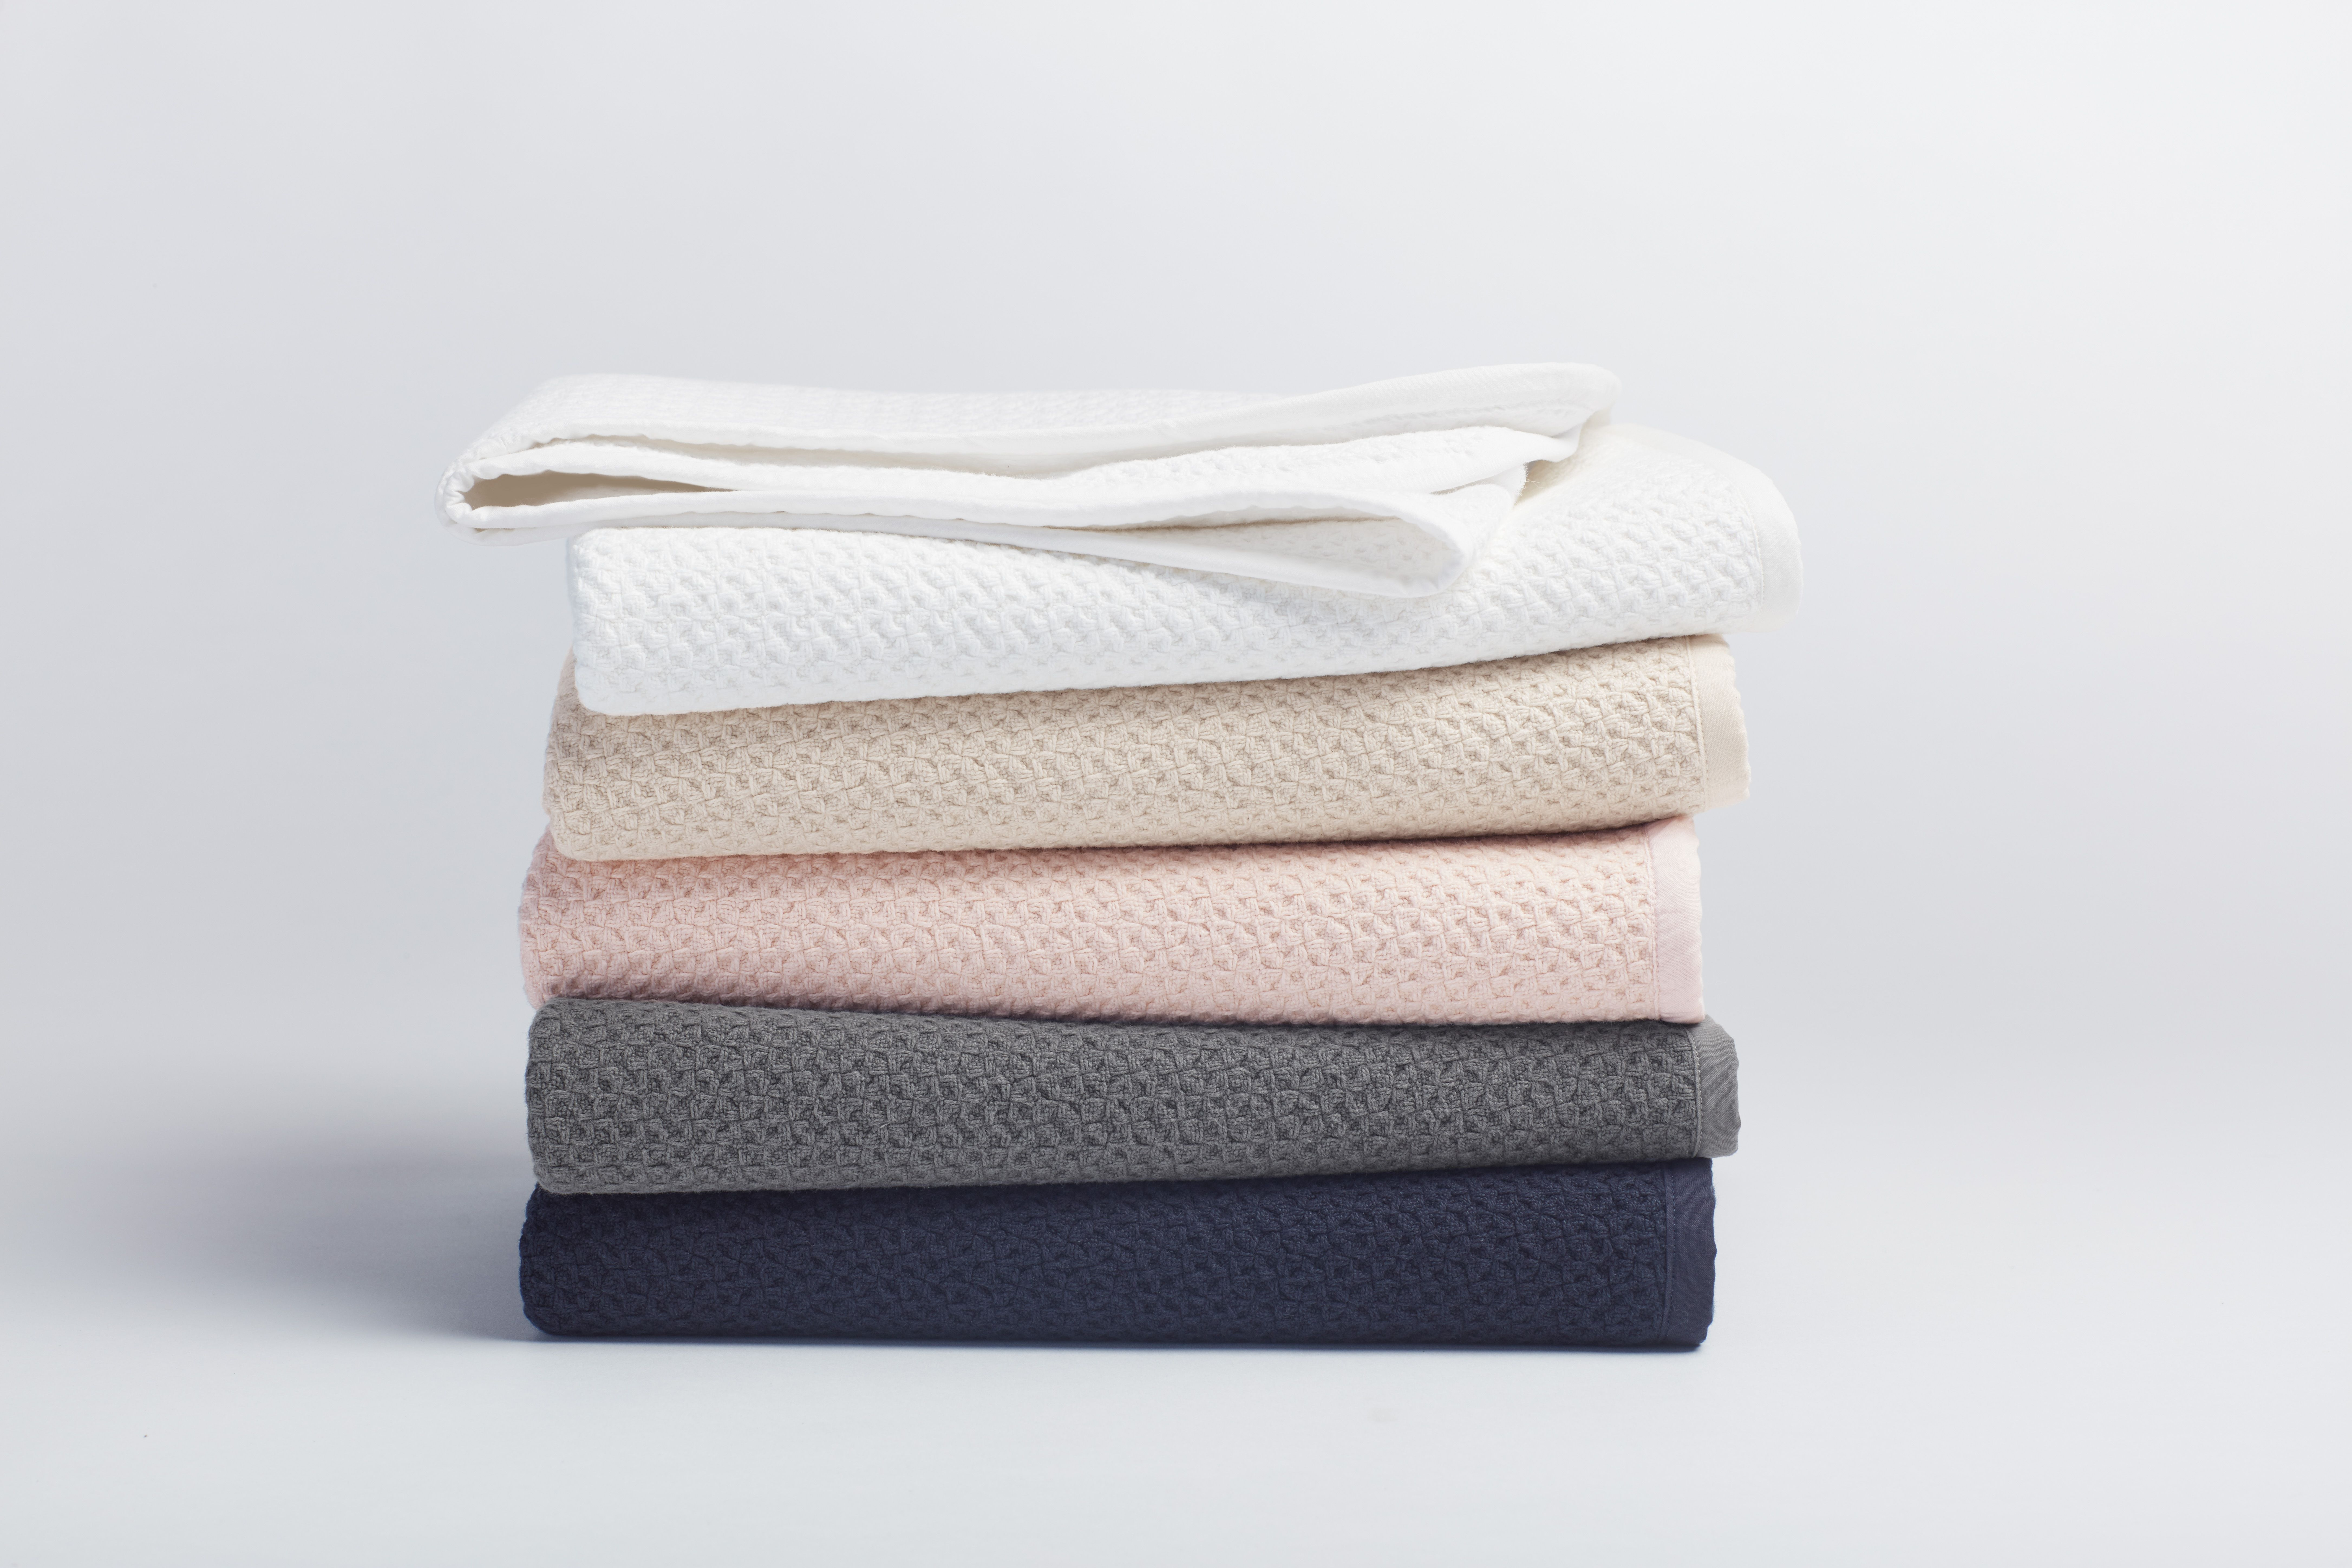 Keep Mom Cozy In A Fairtrade Blanket From Coyuchi Fairher Organic Blankets Coyuchi Honeycomb Blanket